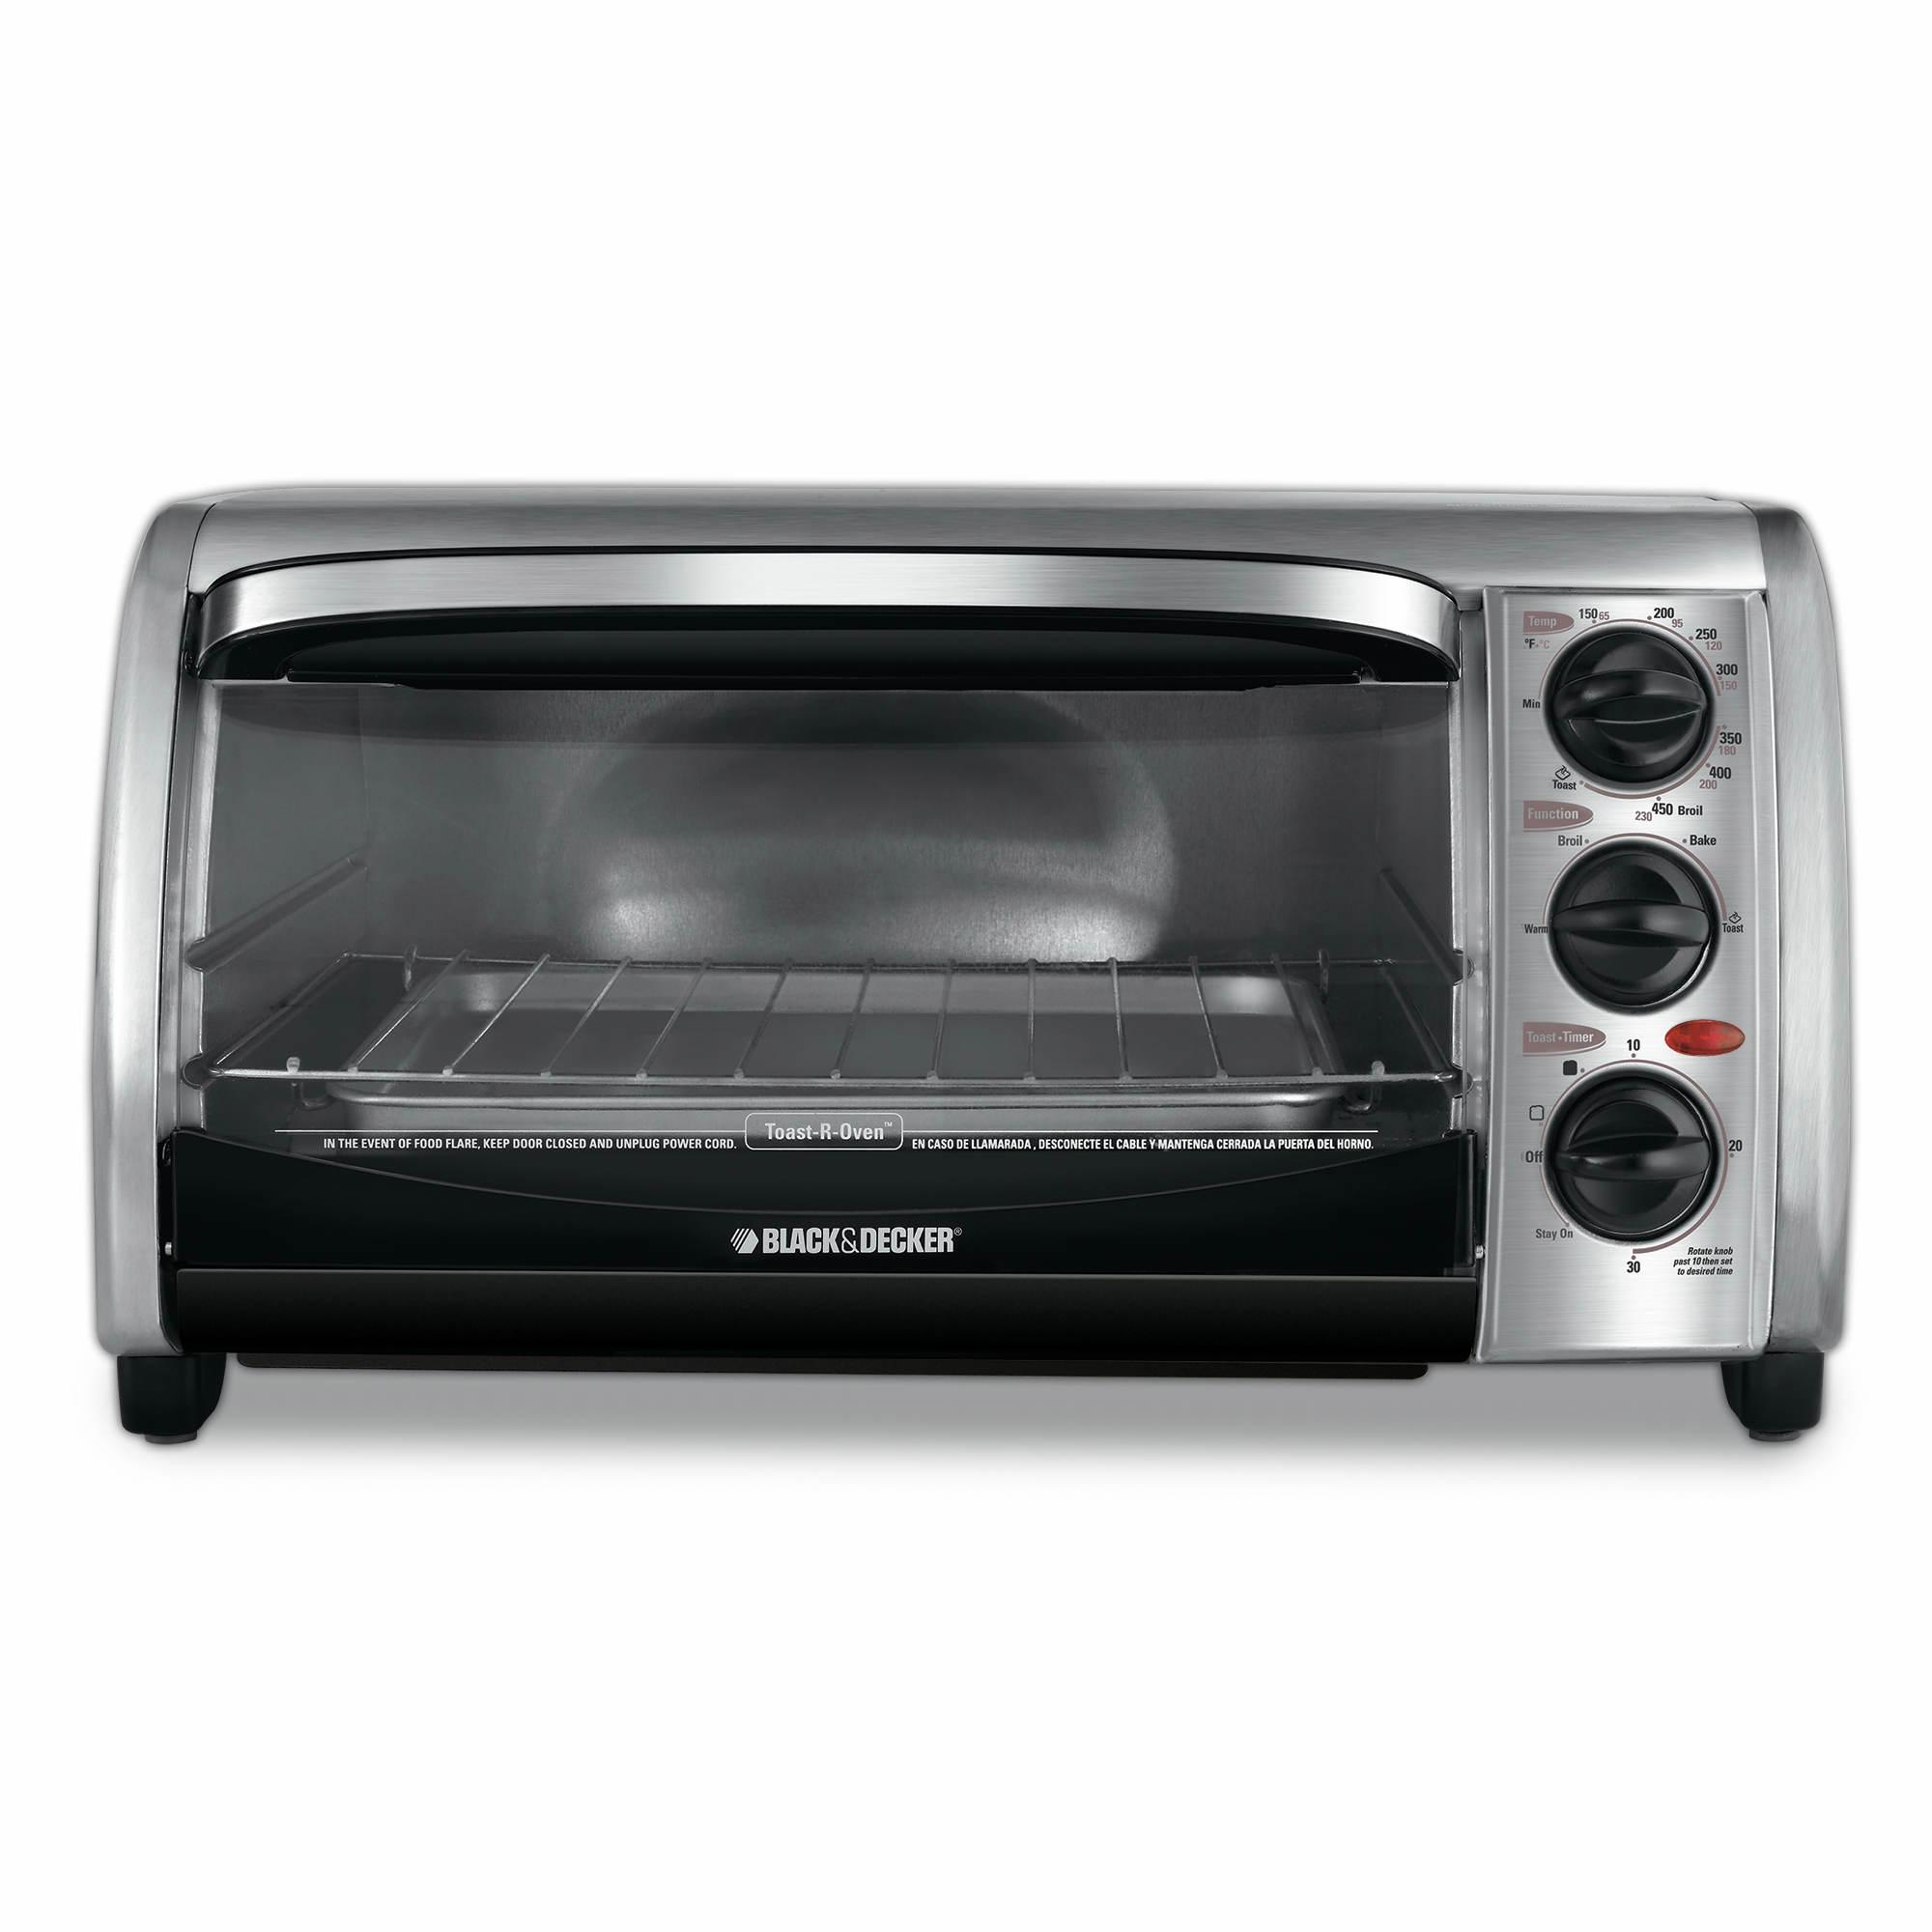 Toaster essay